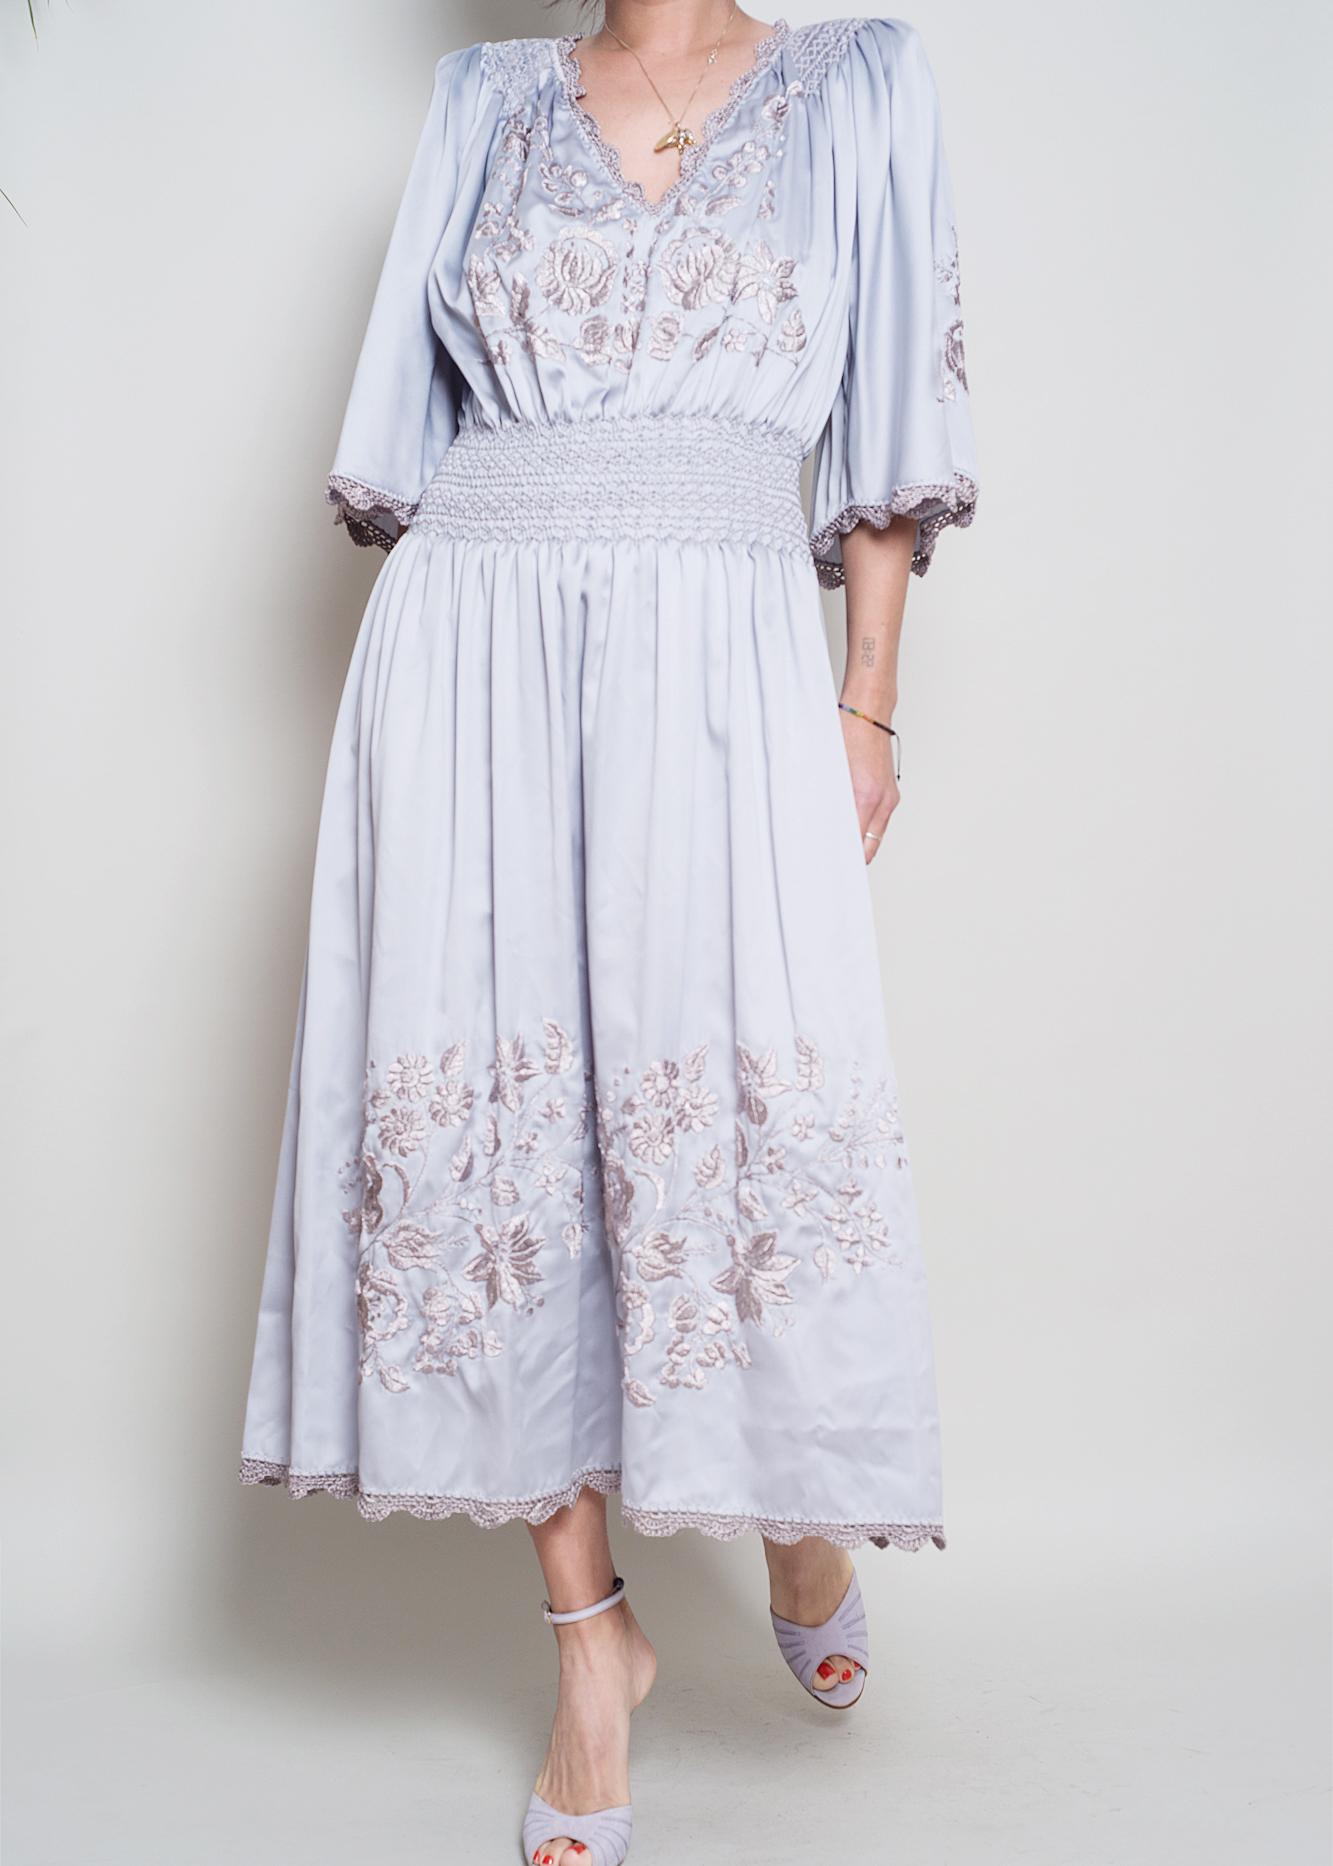 A_Part_of_the_Rest_Vintage_ Embroidery Satin Smock Waist Lavender Midi Dress002.jpg